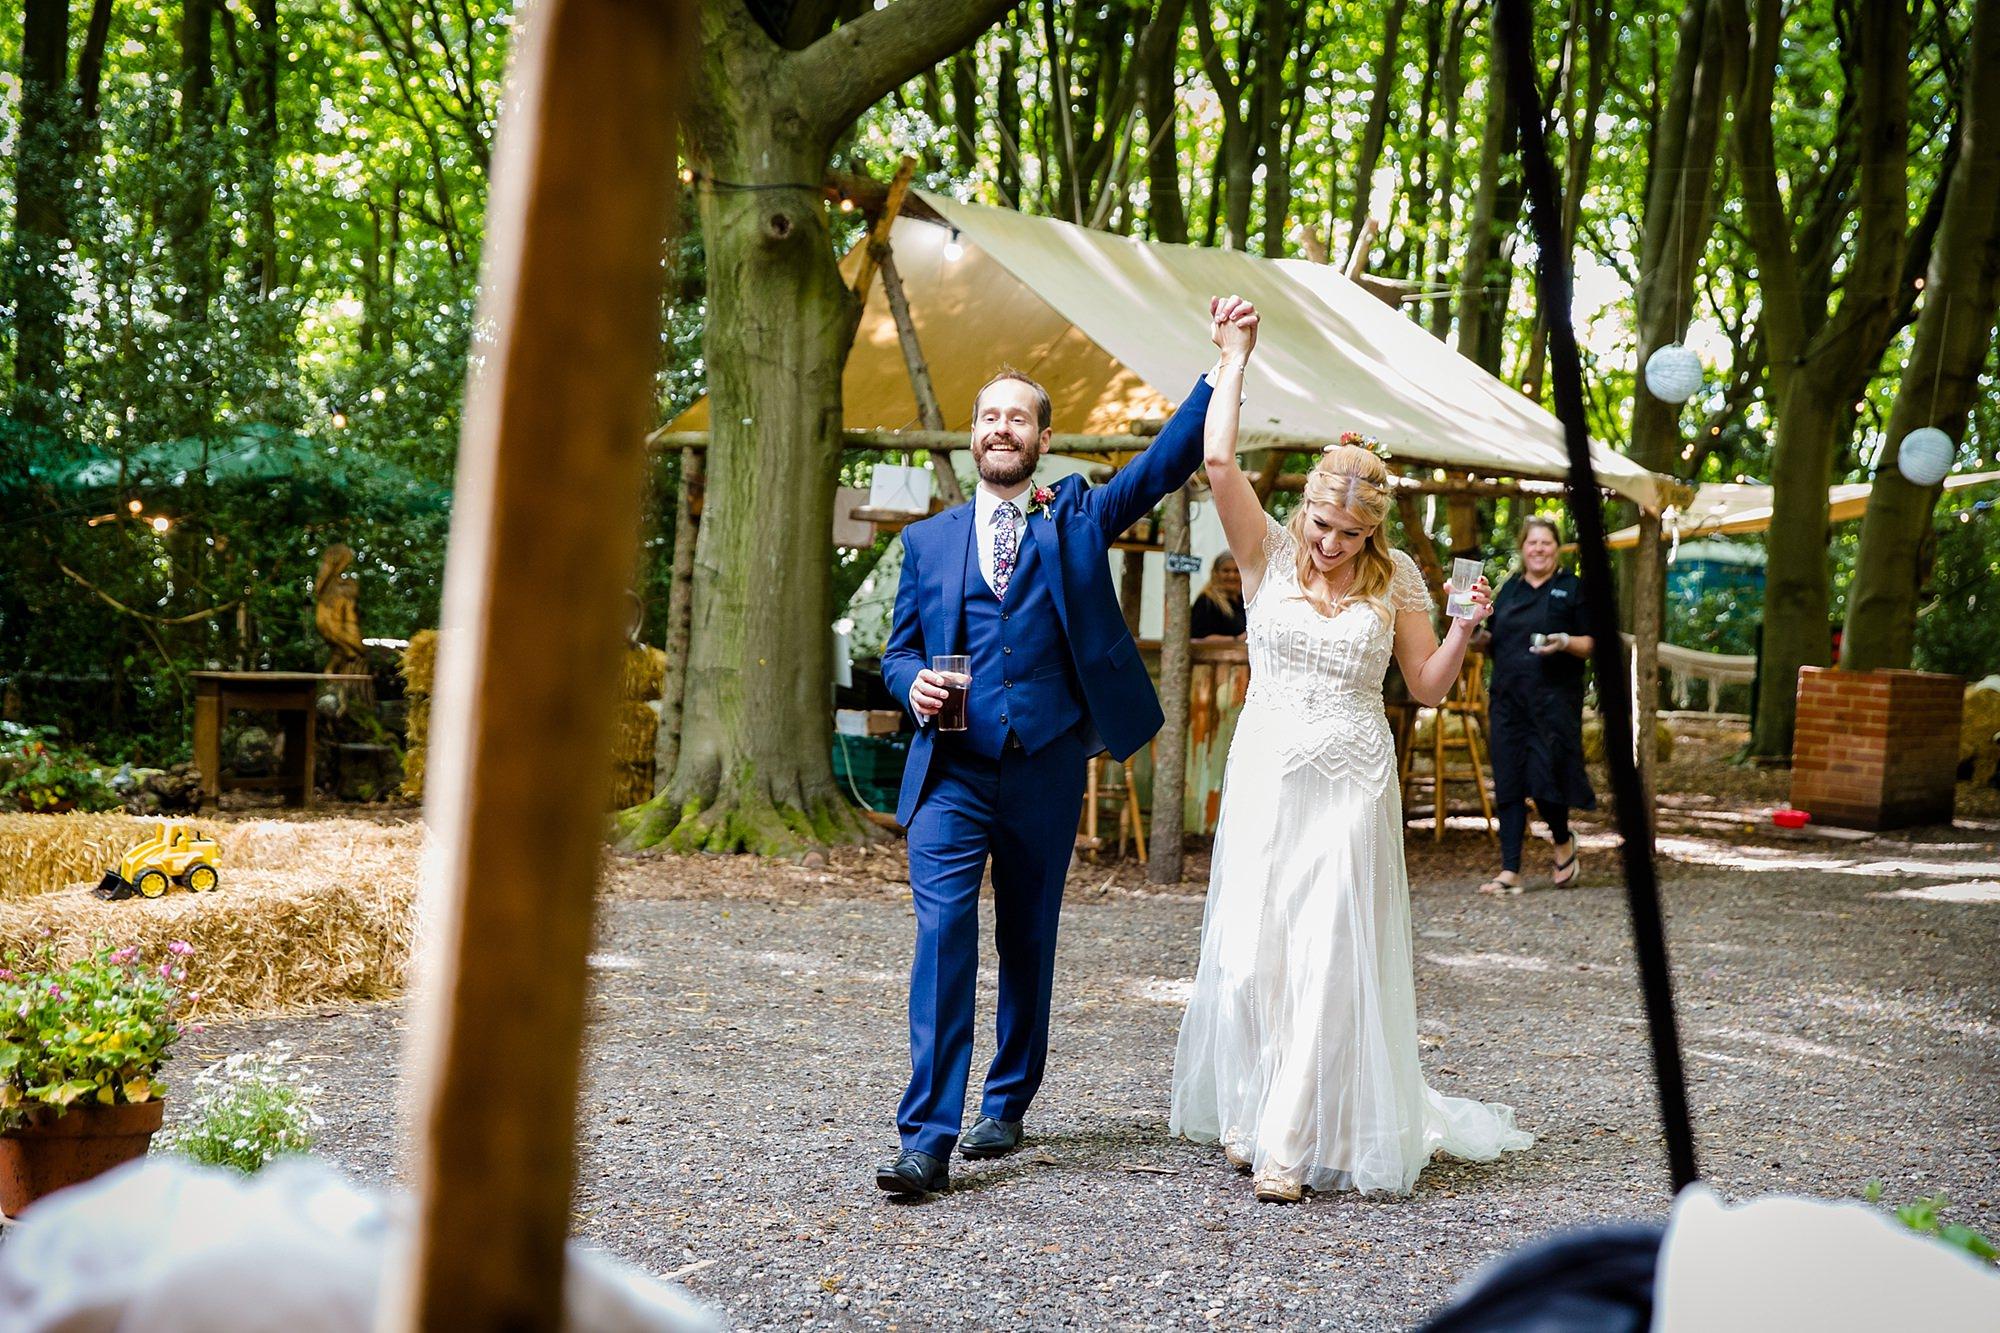 Woodland Weddings Truing bride and groom cheering